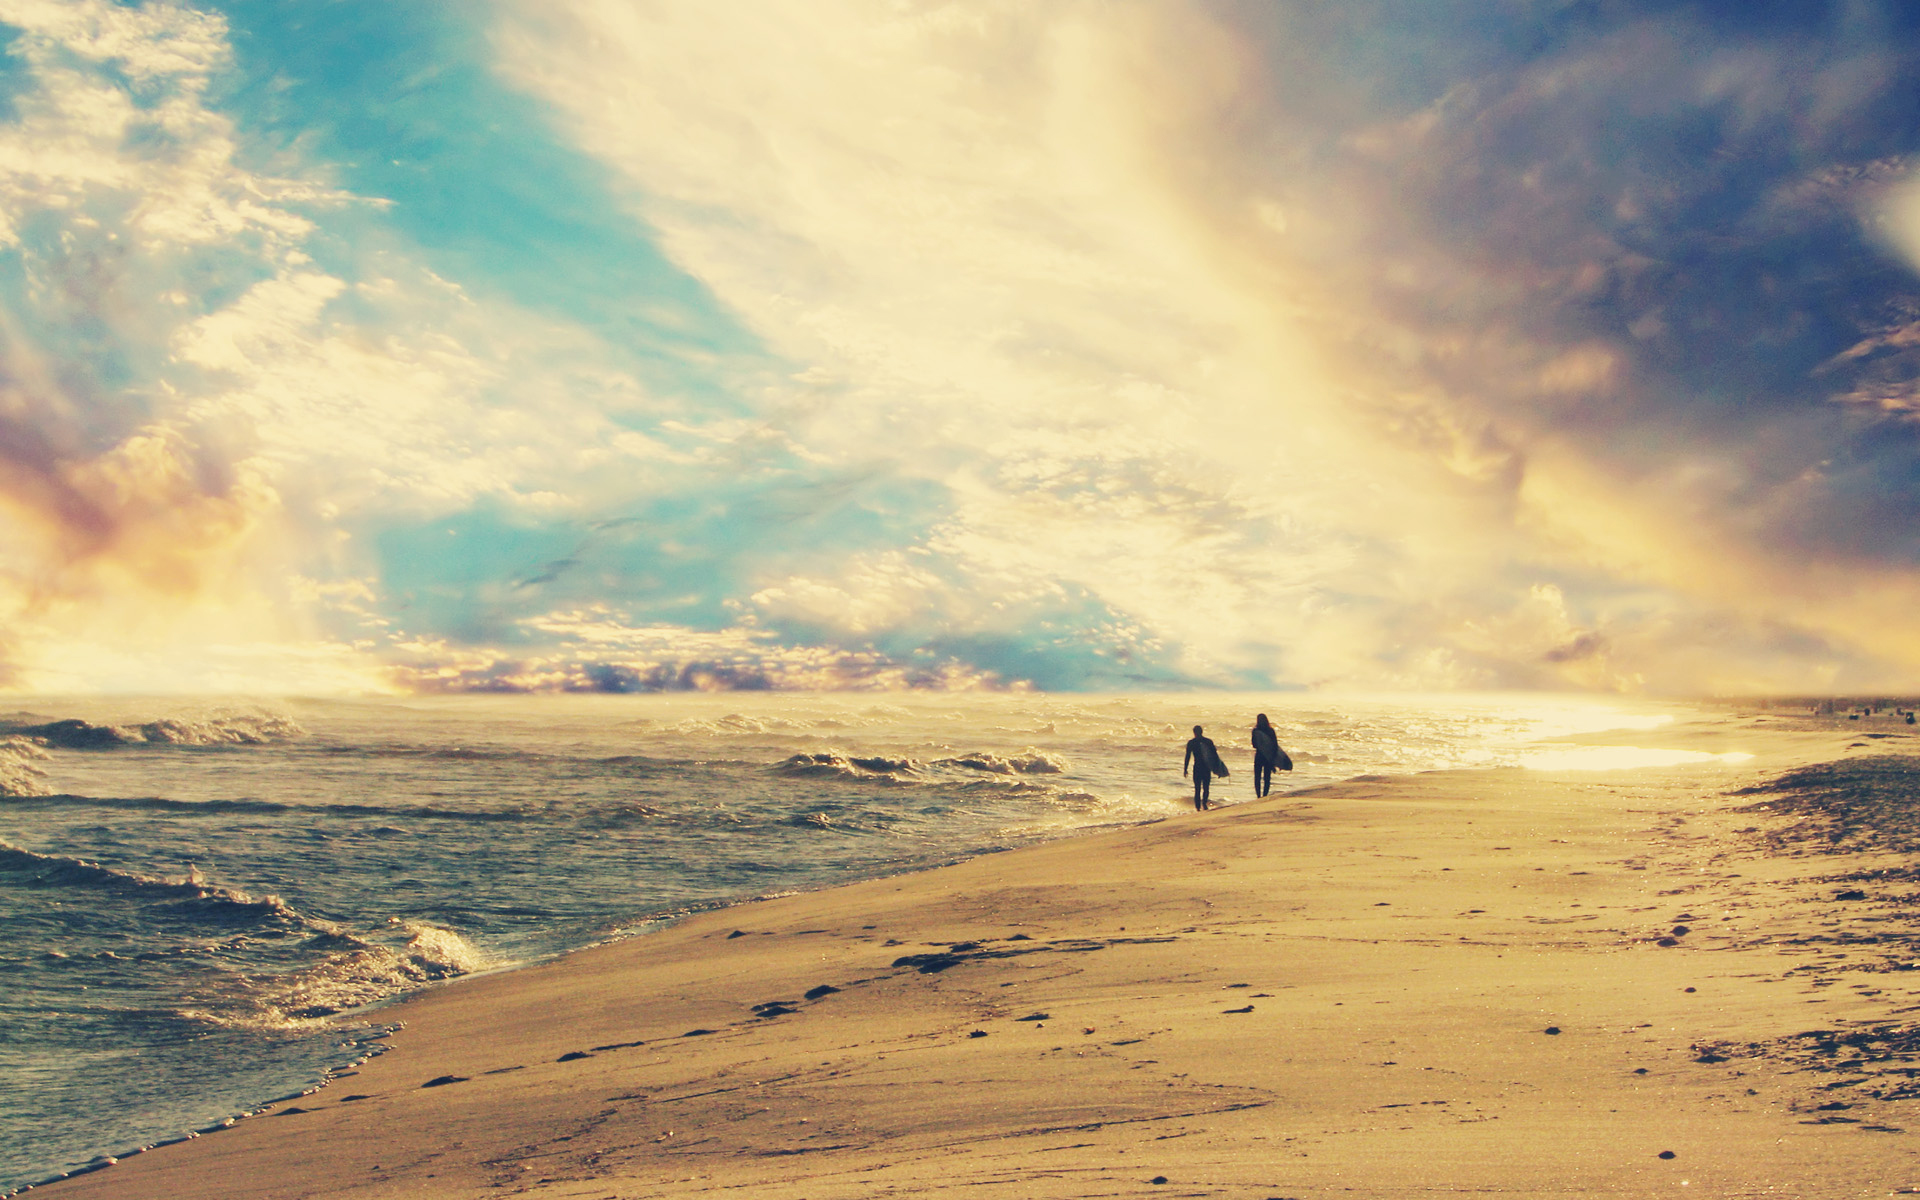 beach-surfers_00428699